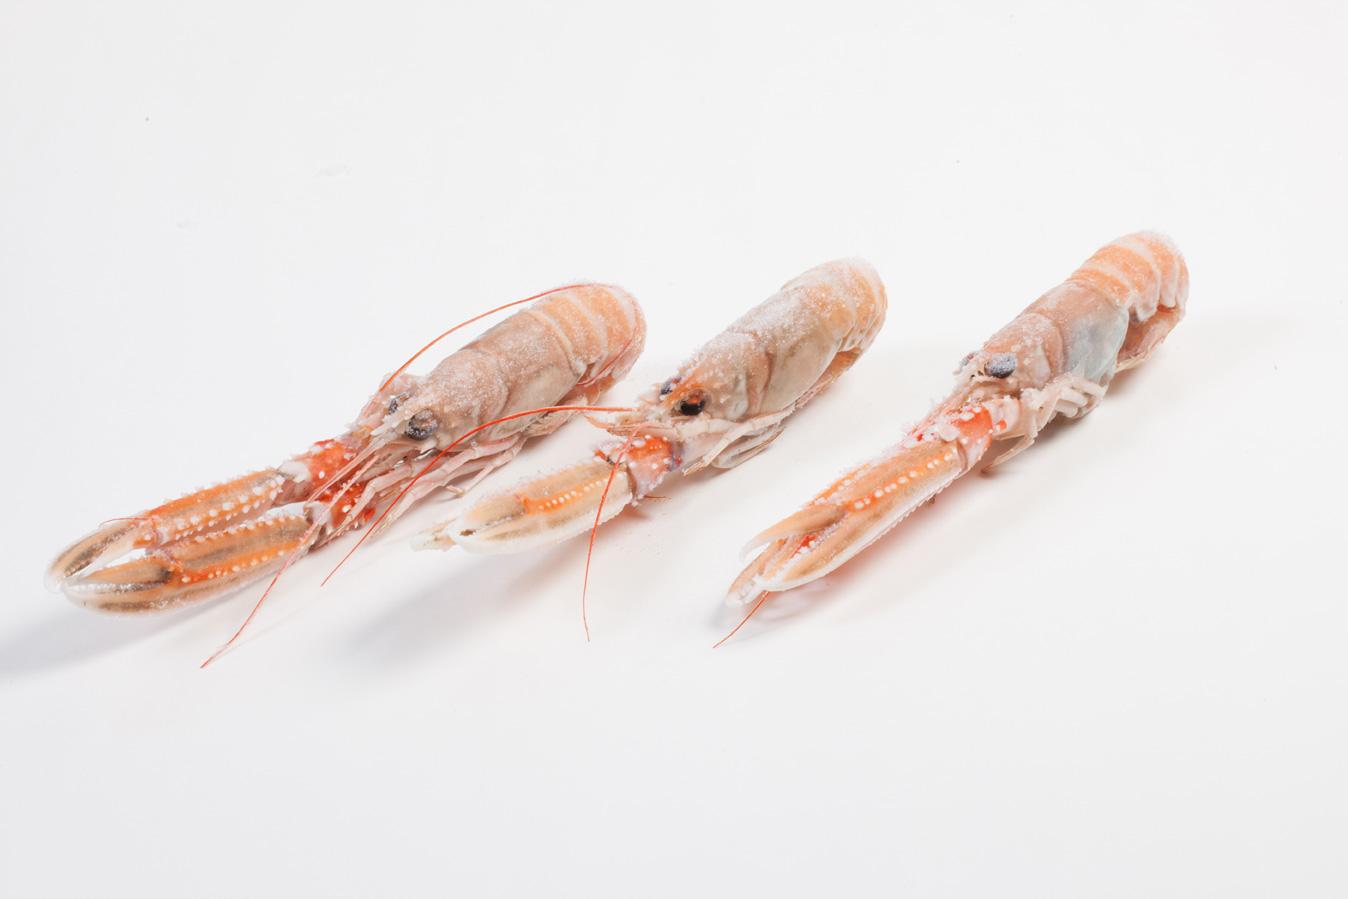 Groothandel-vis-FishXL-schaaldieren-langoustine_WL_9690